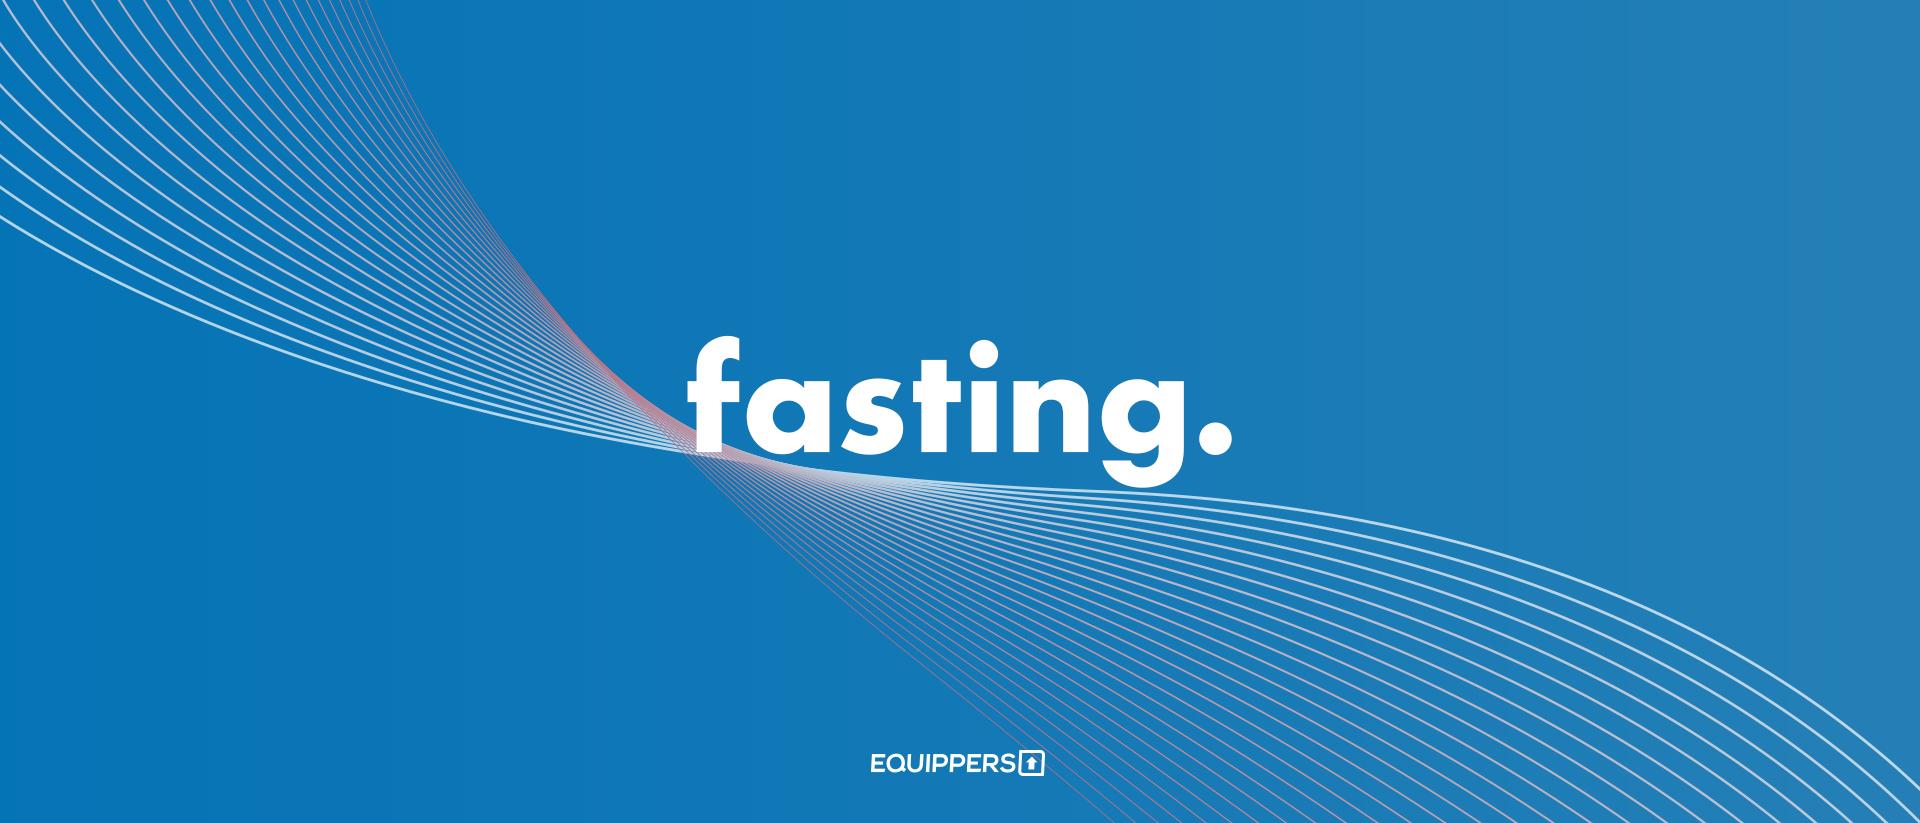 Fasting.